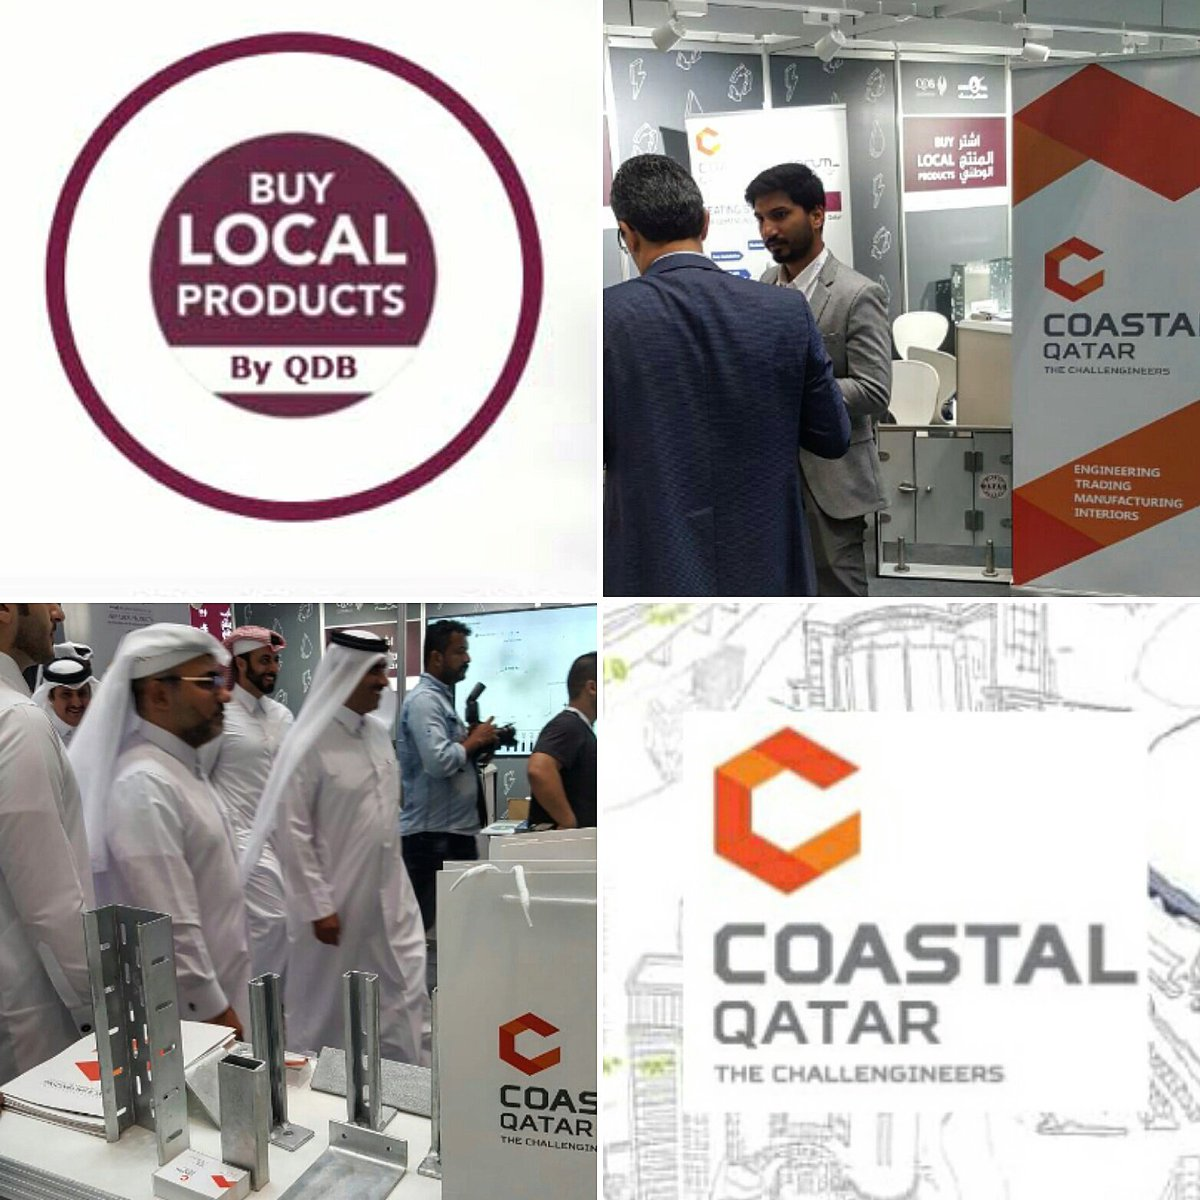 Coastal Qatar on Twitter: